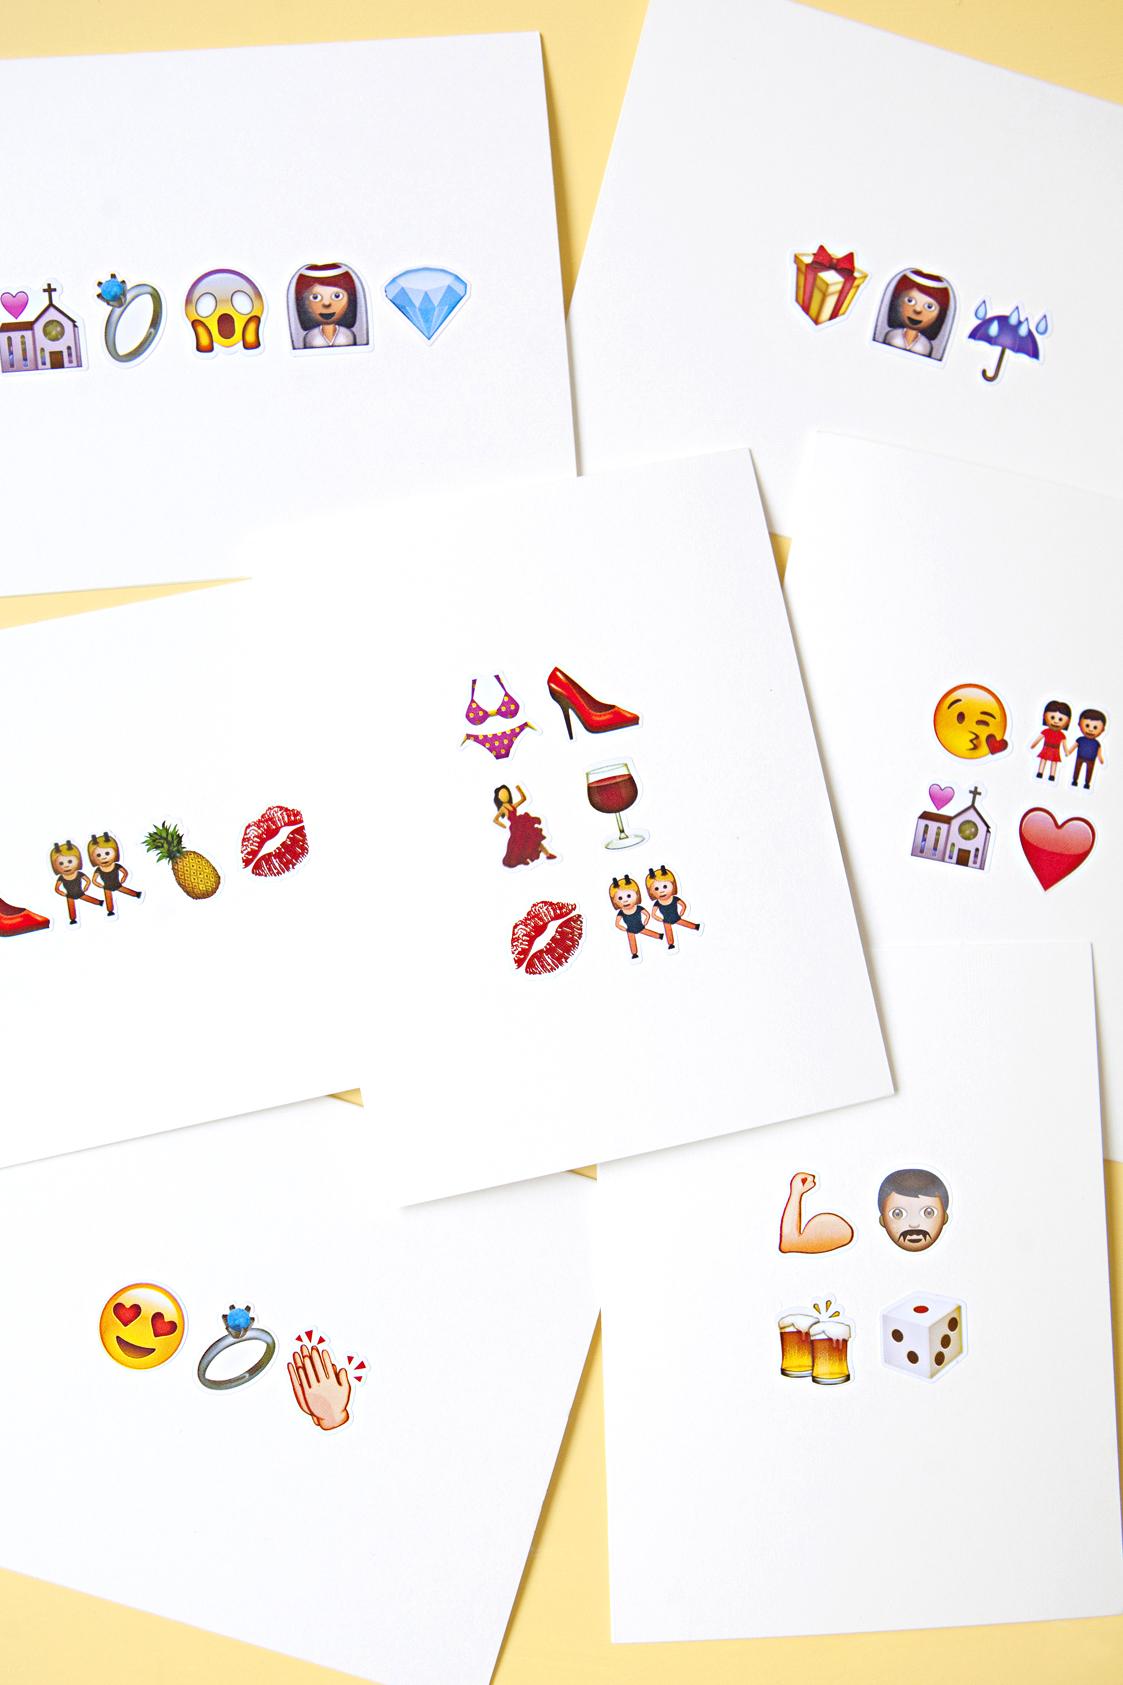 Awesome DIY Emoji Greeting Cards for Weddings